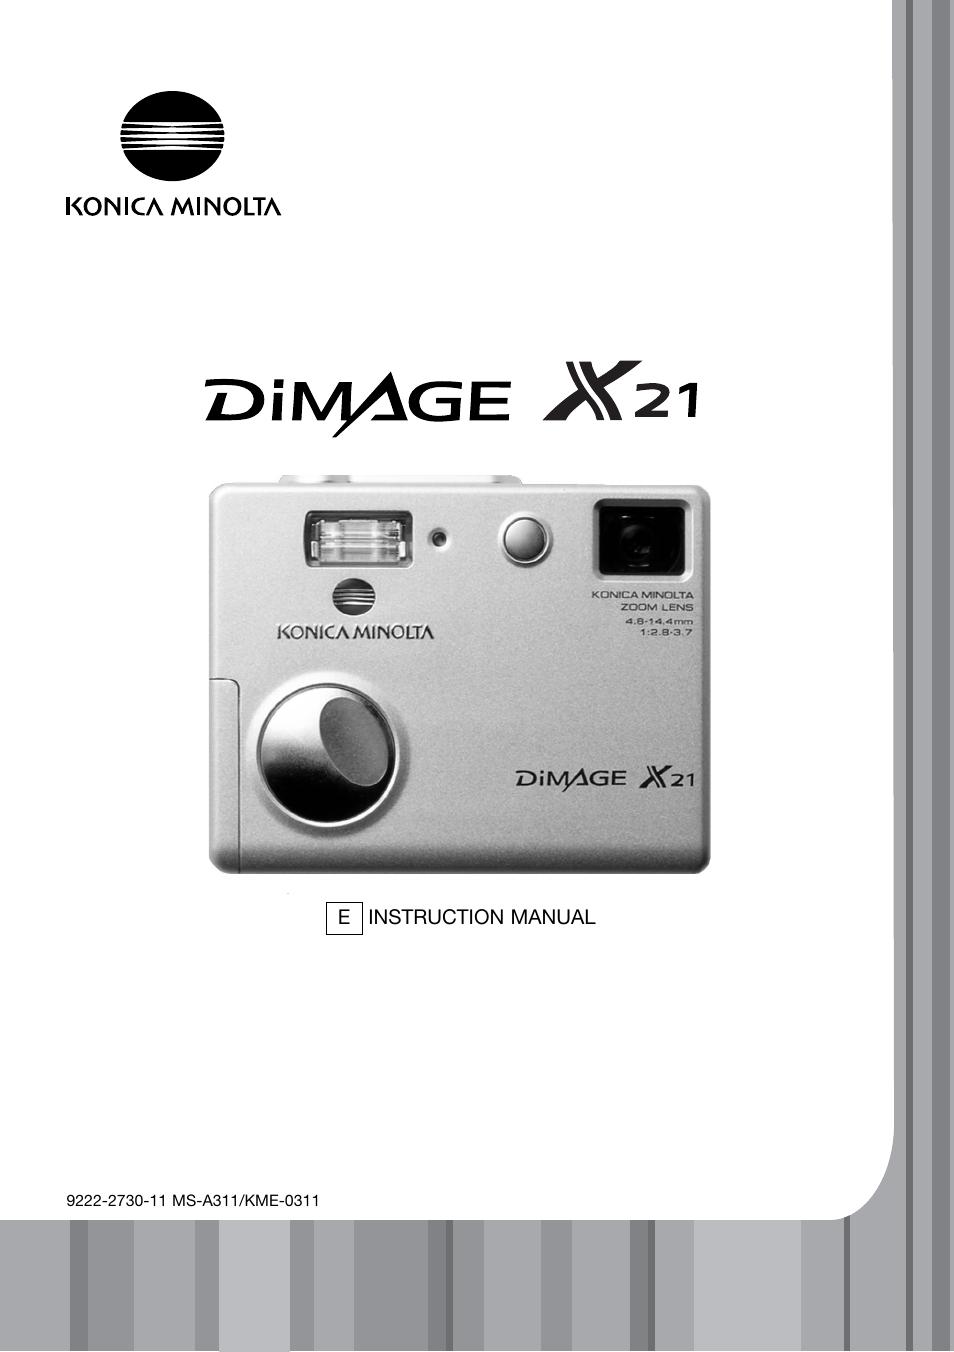 Konica Minolta DiMAGE X21 User Manual | 112 pages